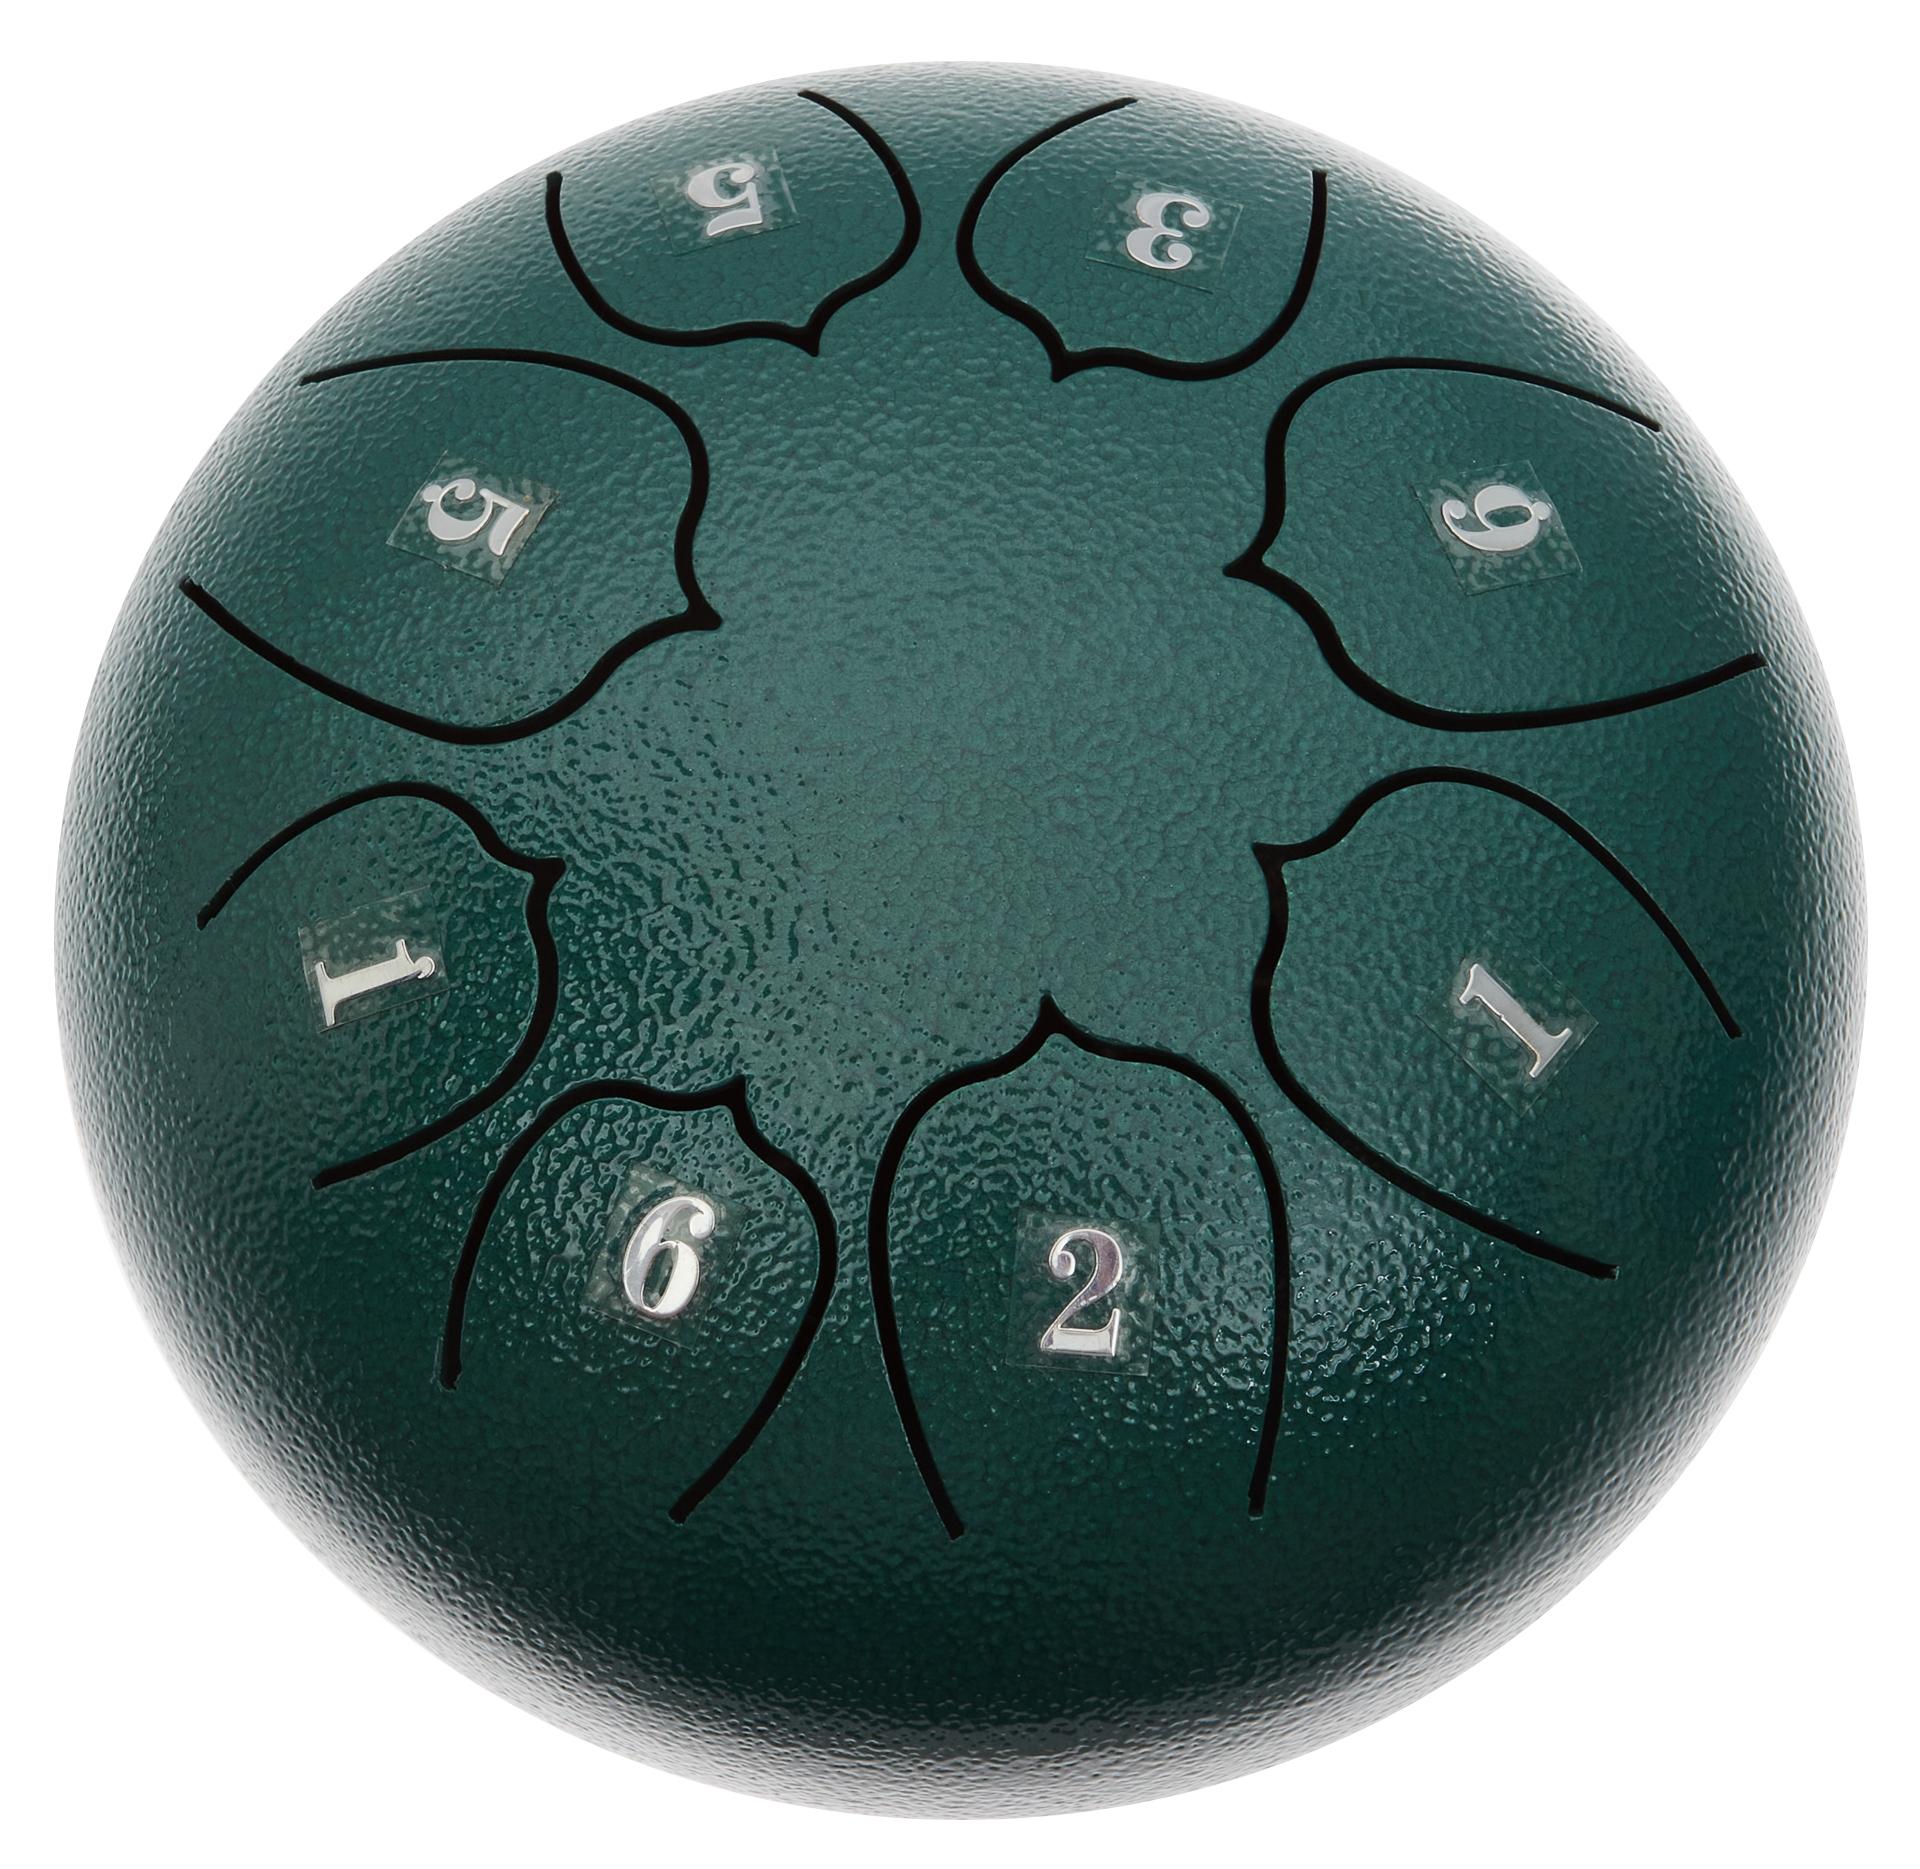 BYLA LCT6 - Green